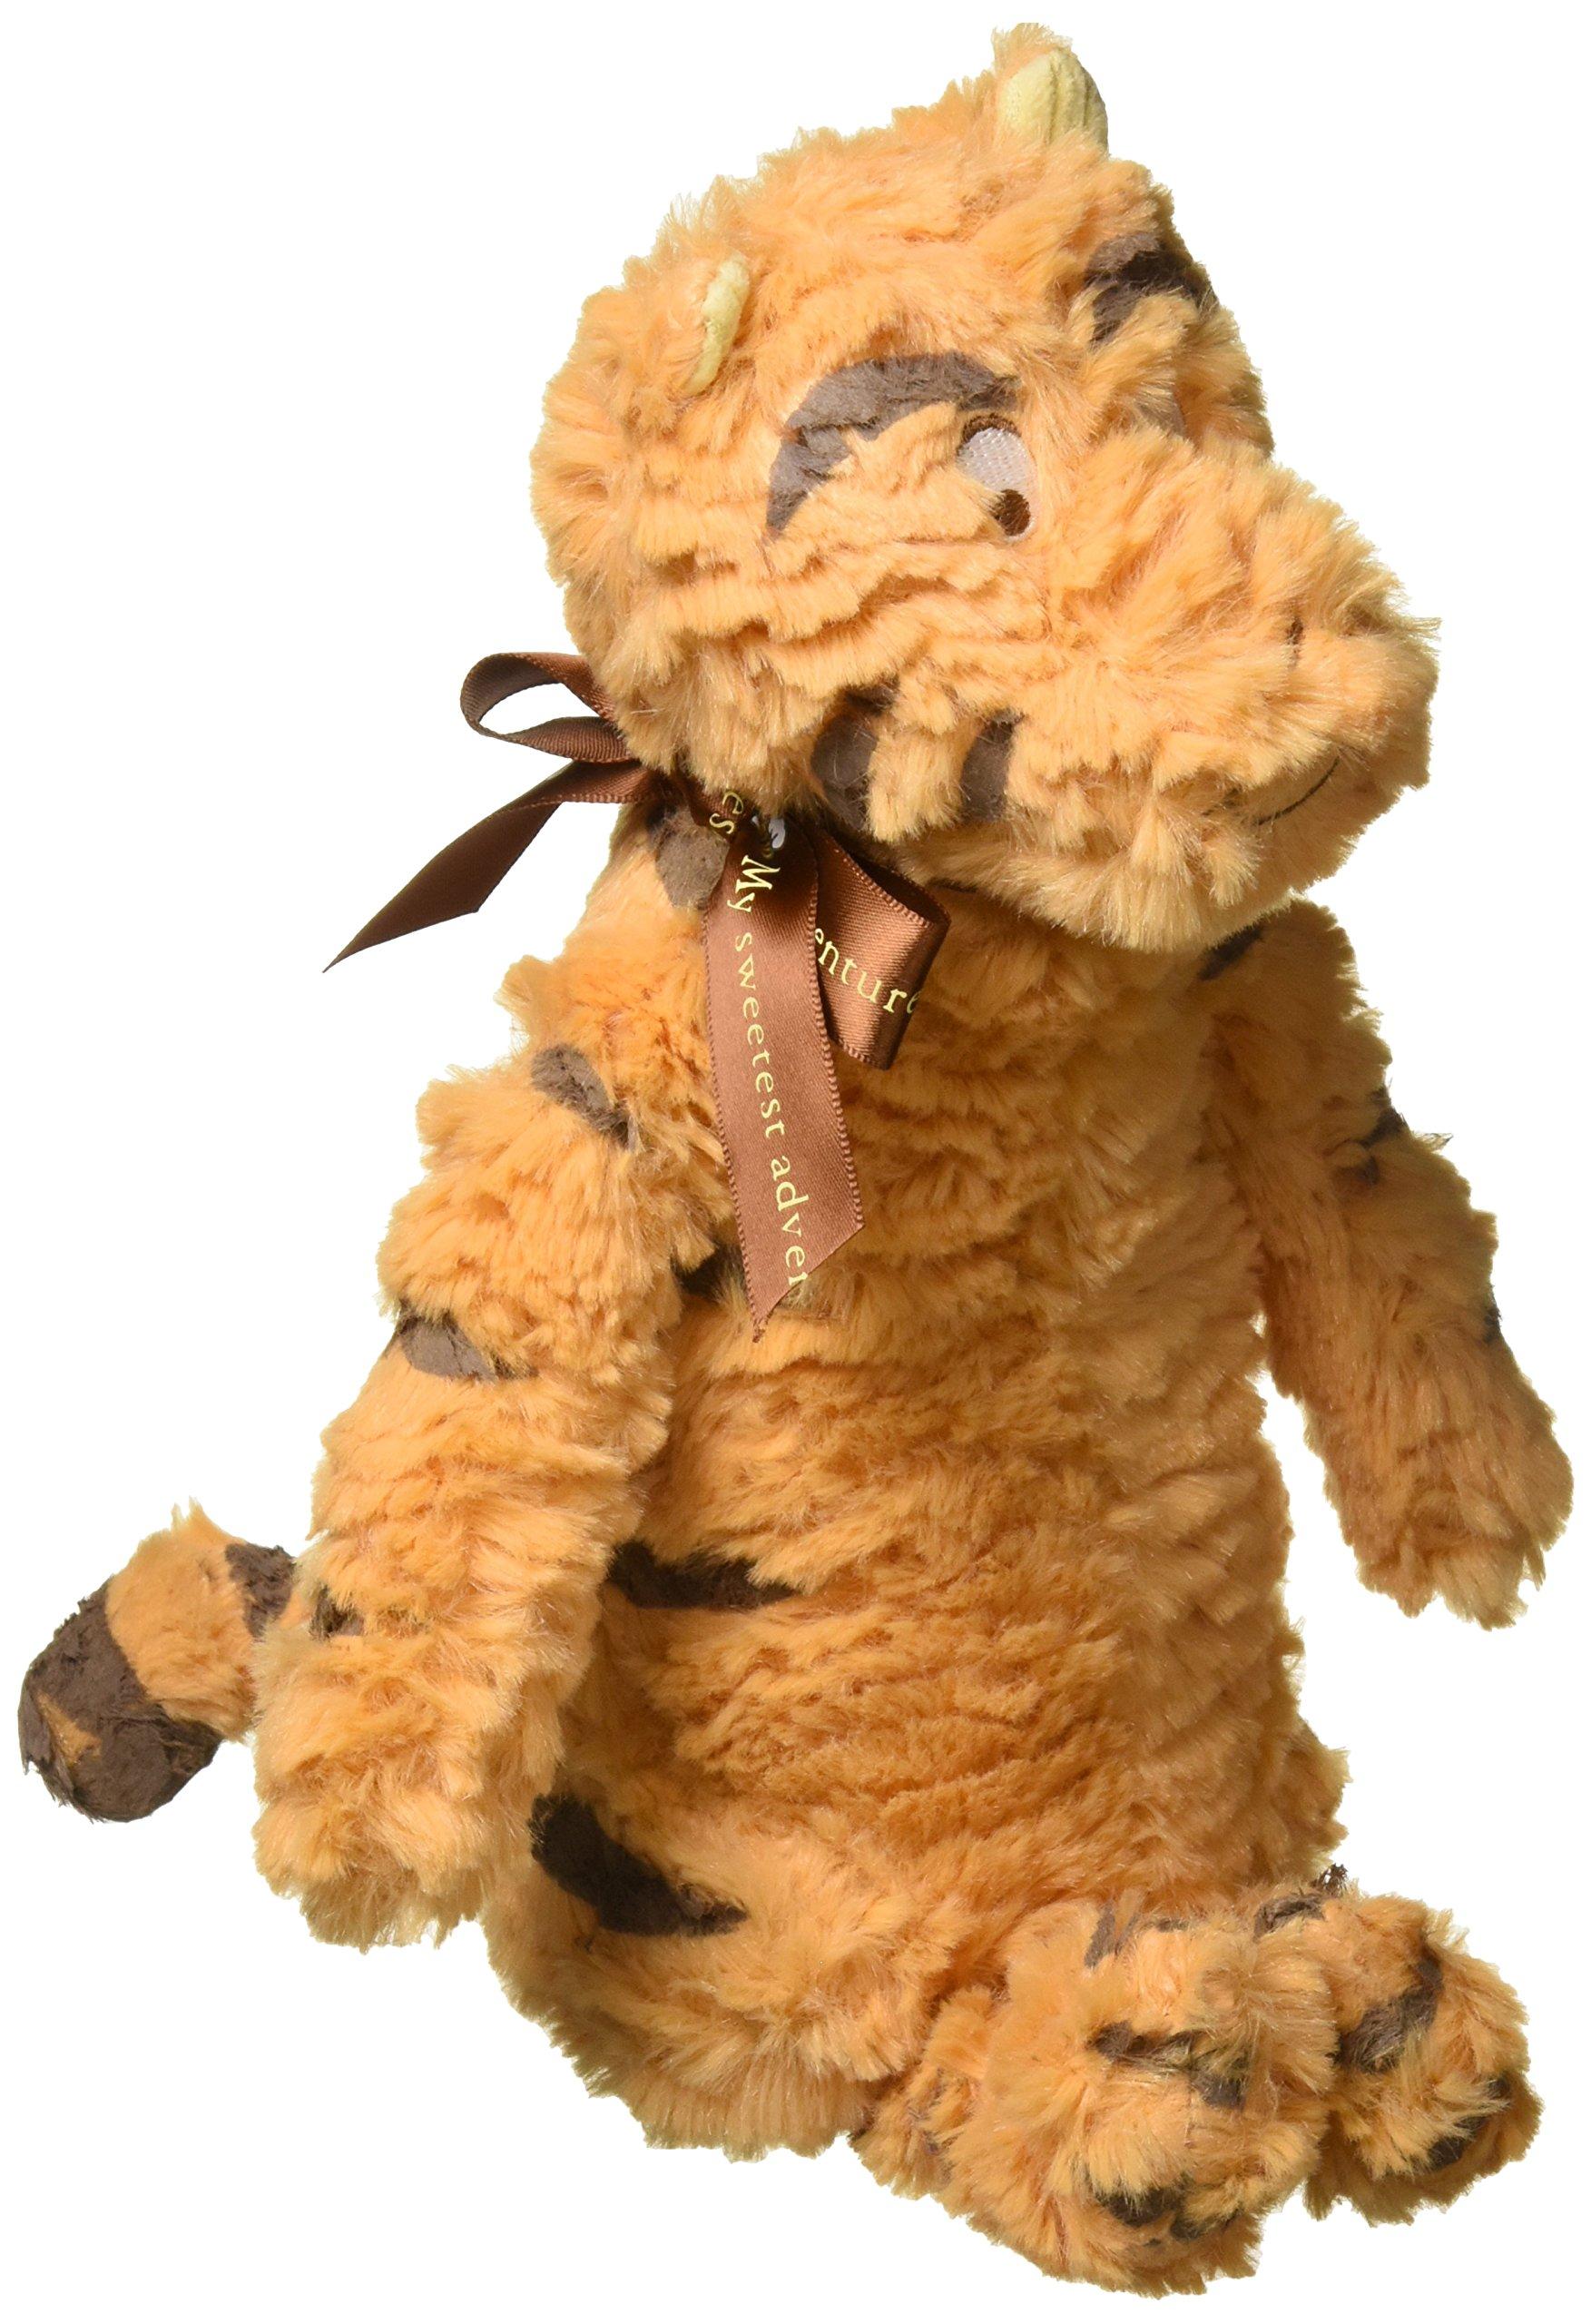 Amazon Com Classic Pooh Plush Winnie The Pooh 9 Kids Preferred Baby